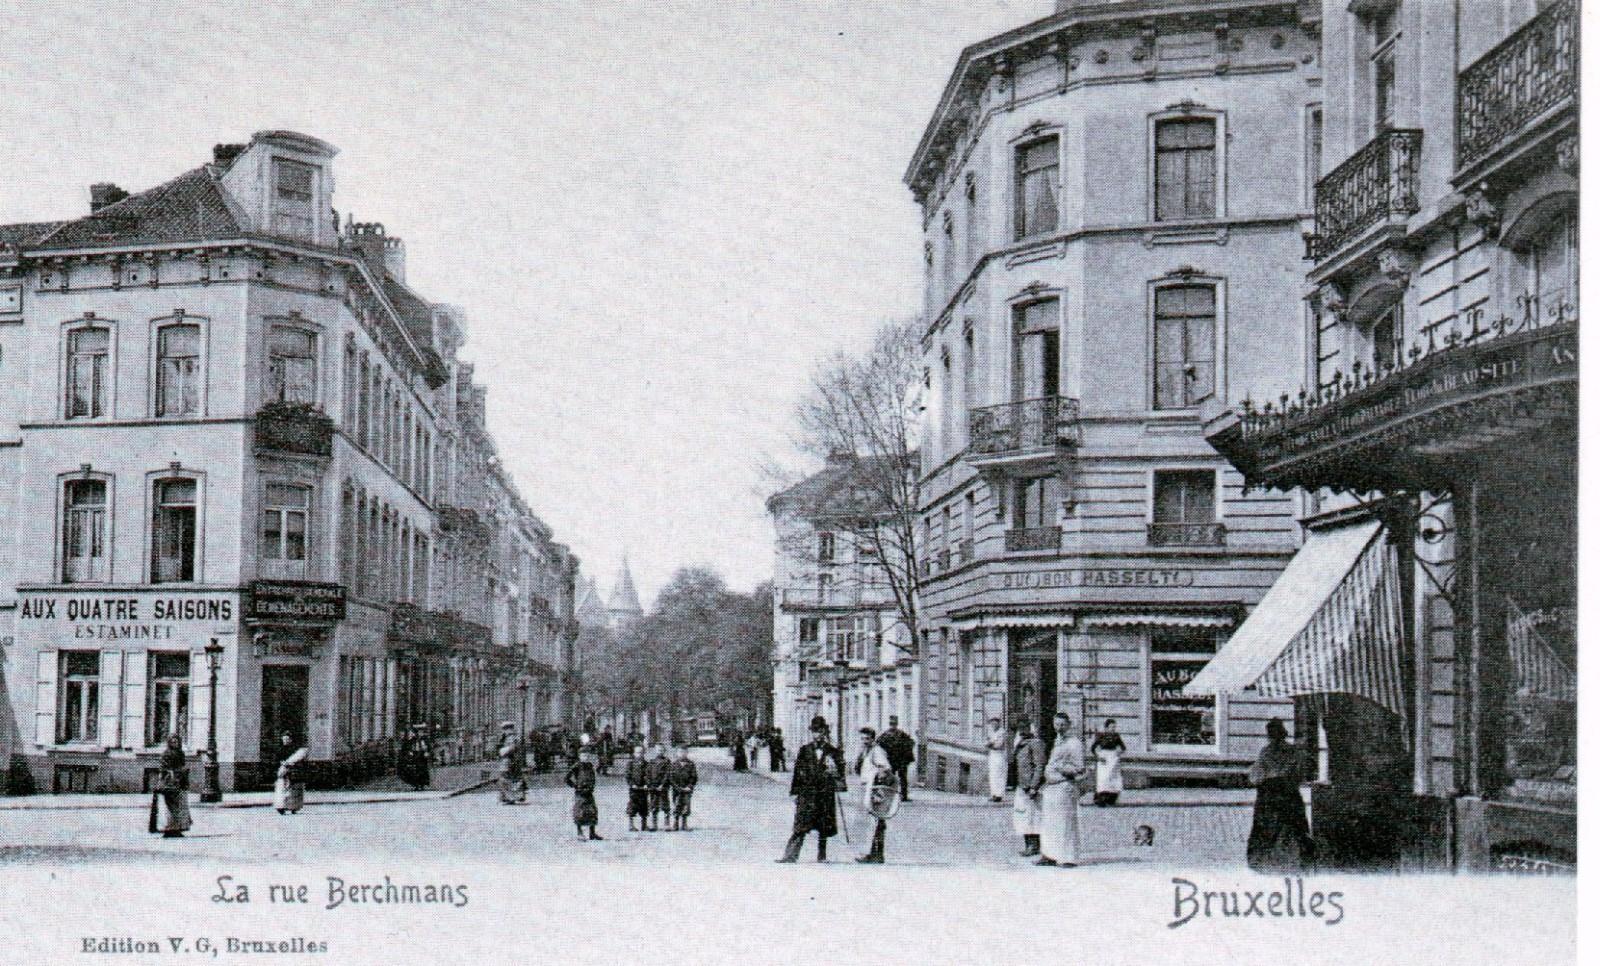 Rue Berckmans, croisement de la rue de l\'Hôtel des Monnaies (Collection de Dexia Banque, avant 1907).